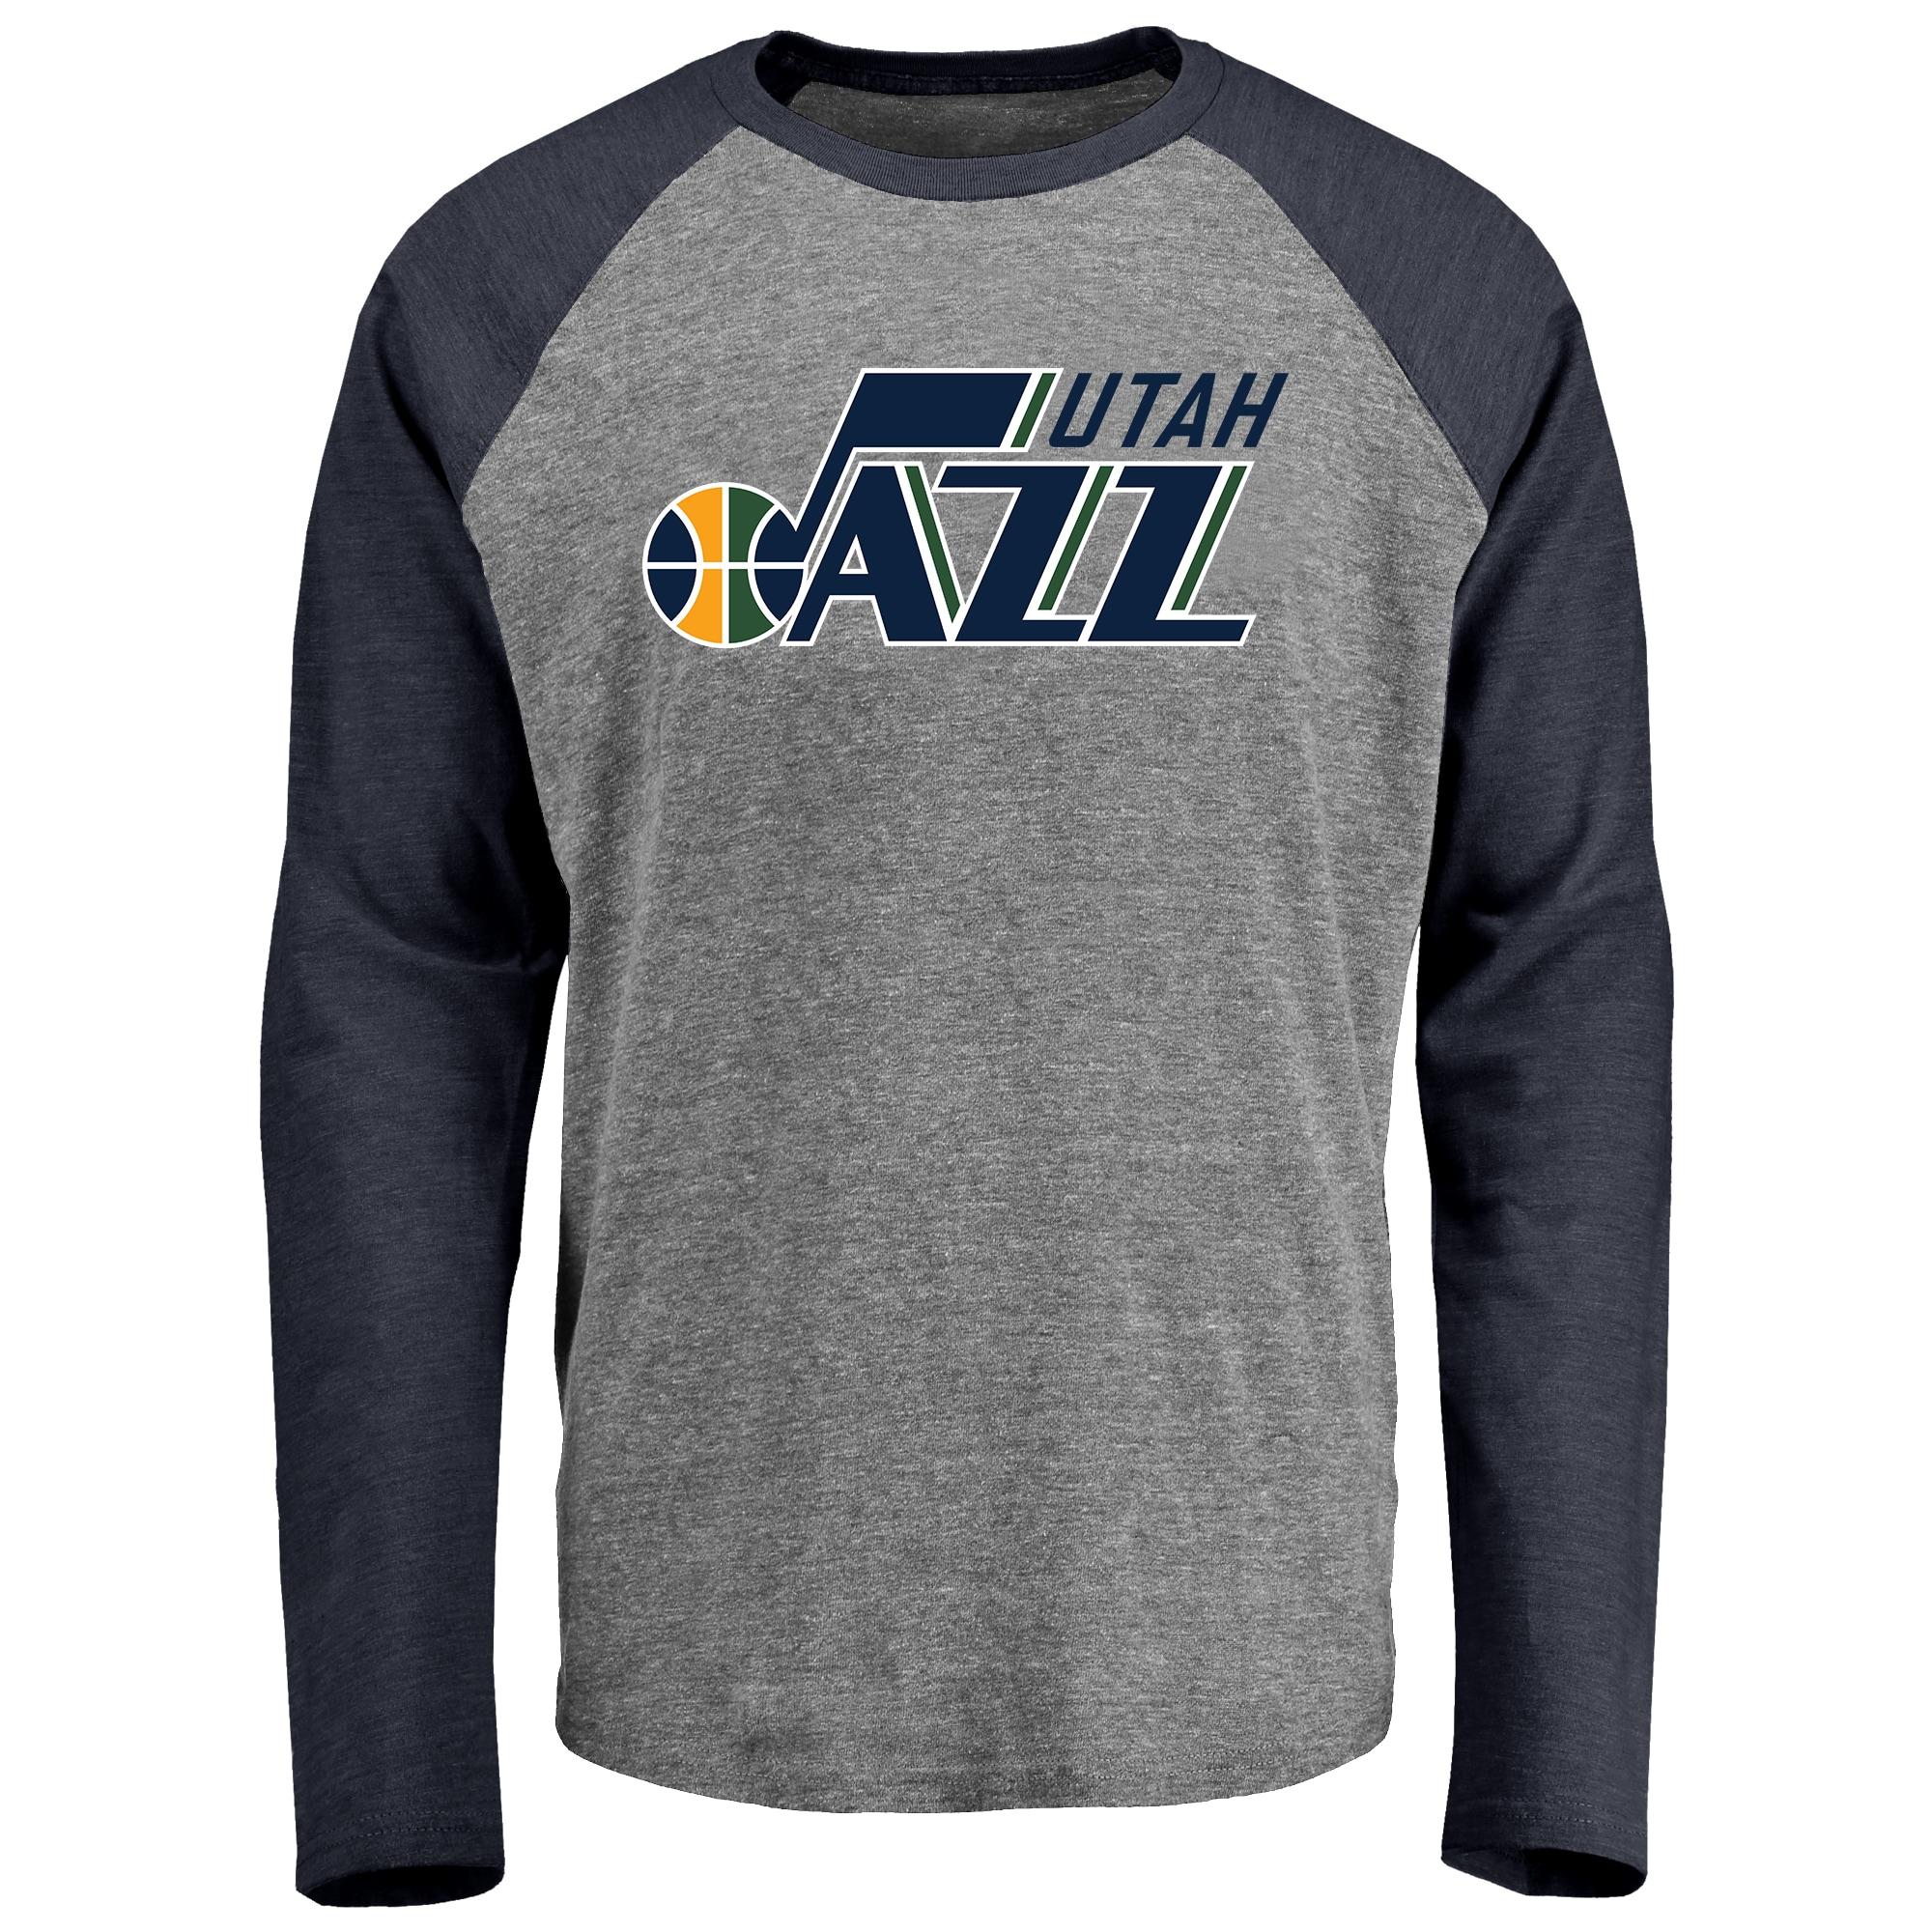 Utah Jazz Fanatics Branded Primary Logo Raglan Long Sleeve T-Shirt - Heathered Gray